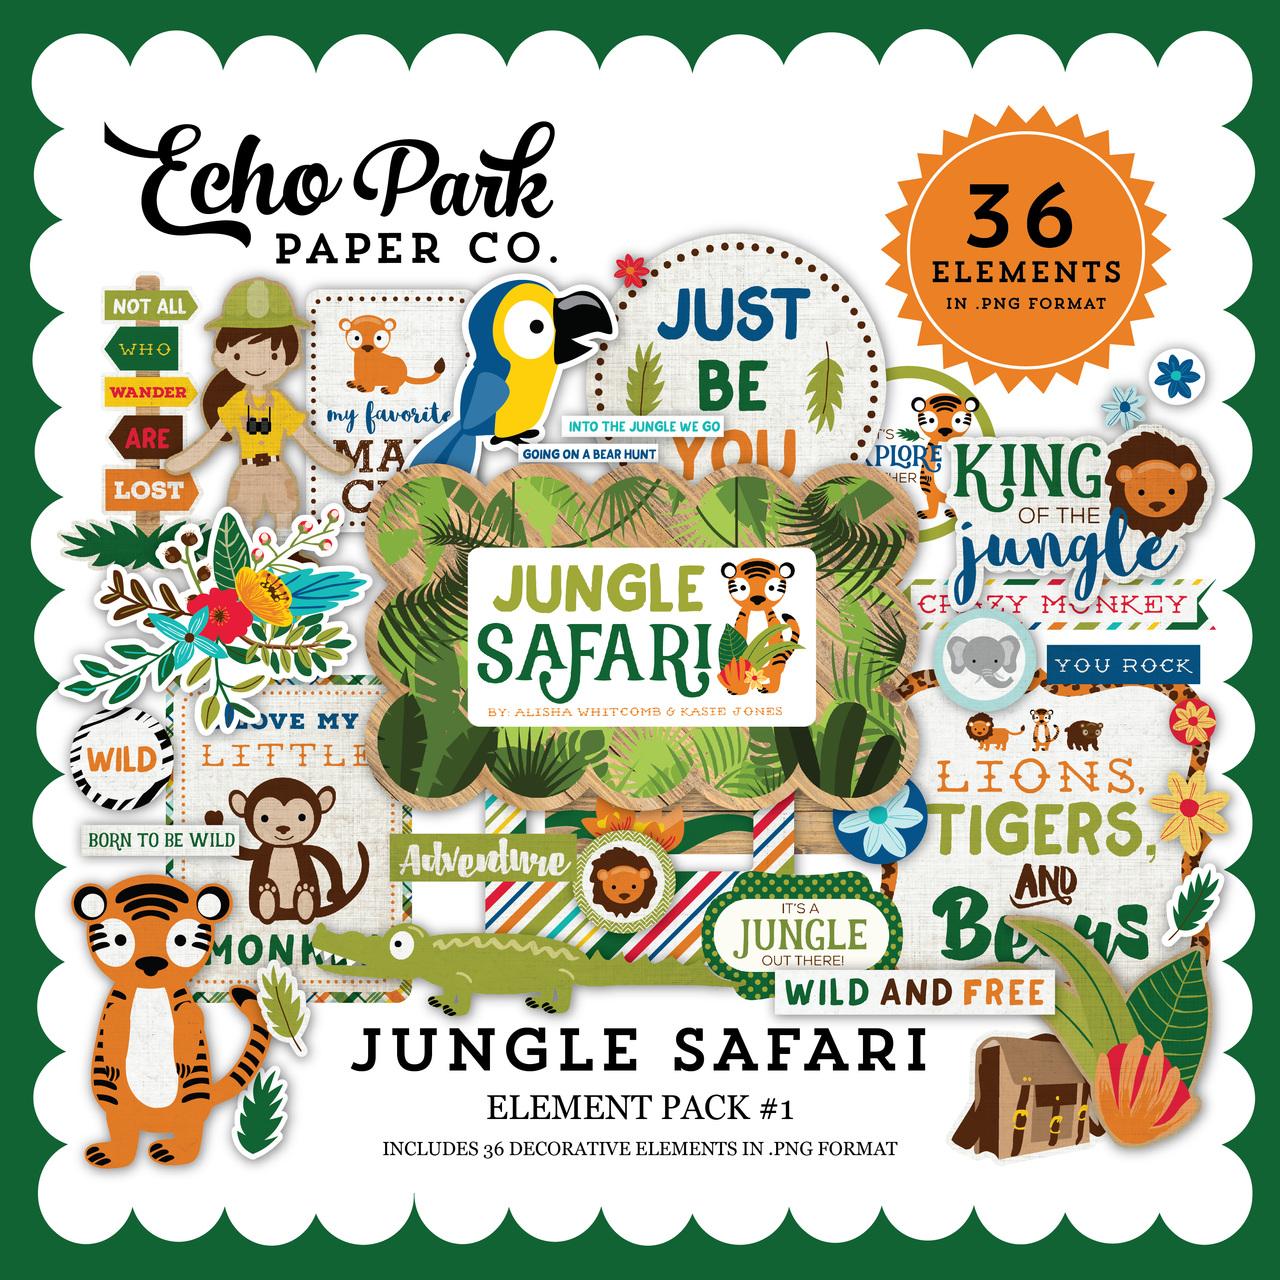 Jungle Safari Element Pack #1